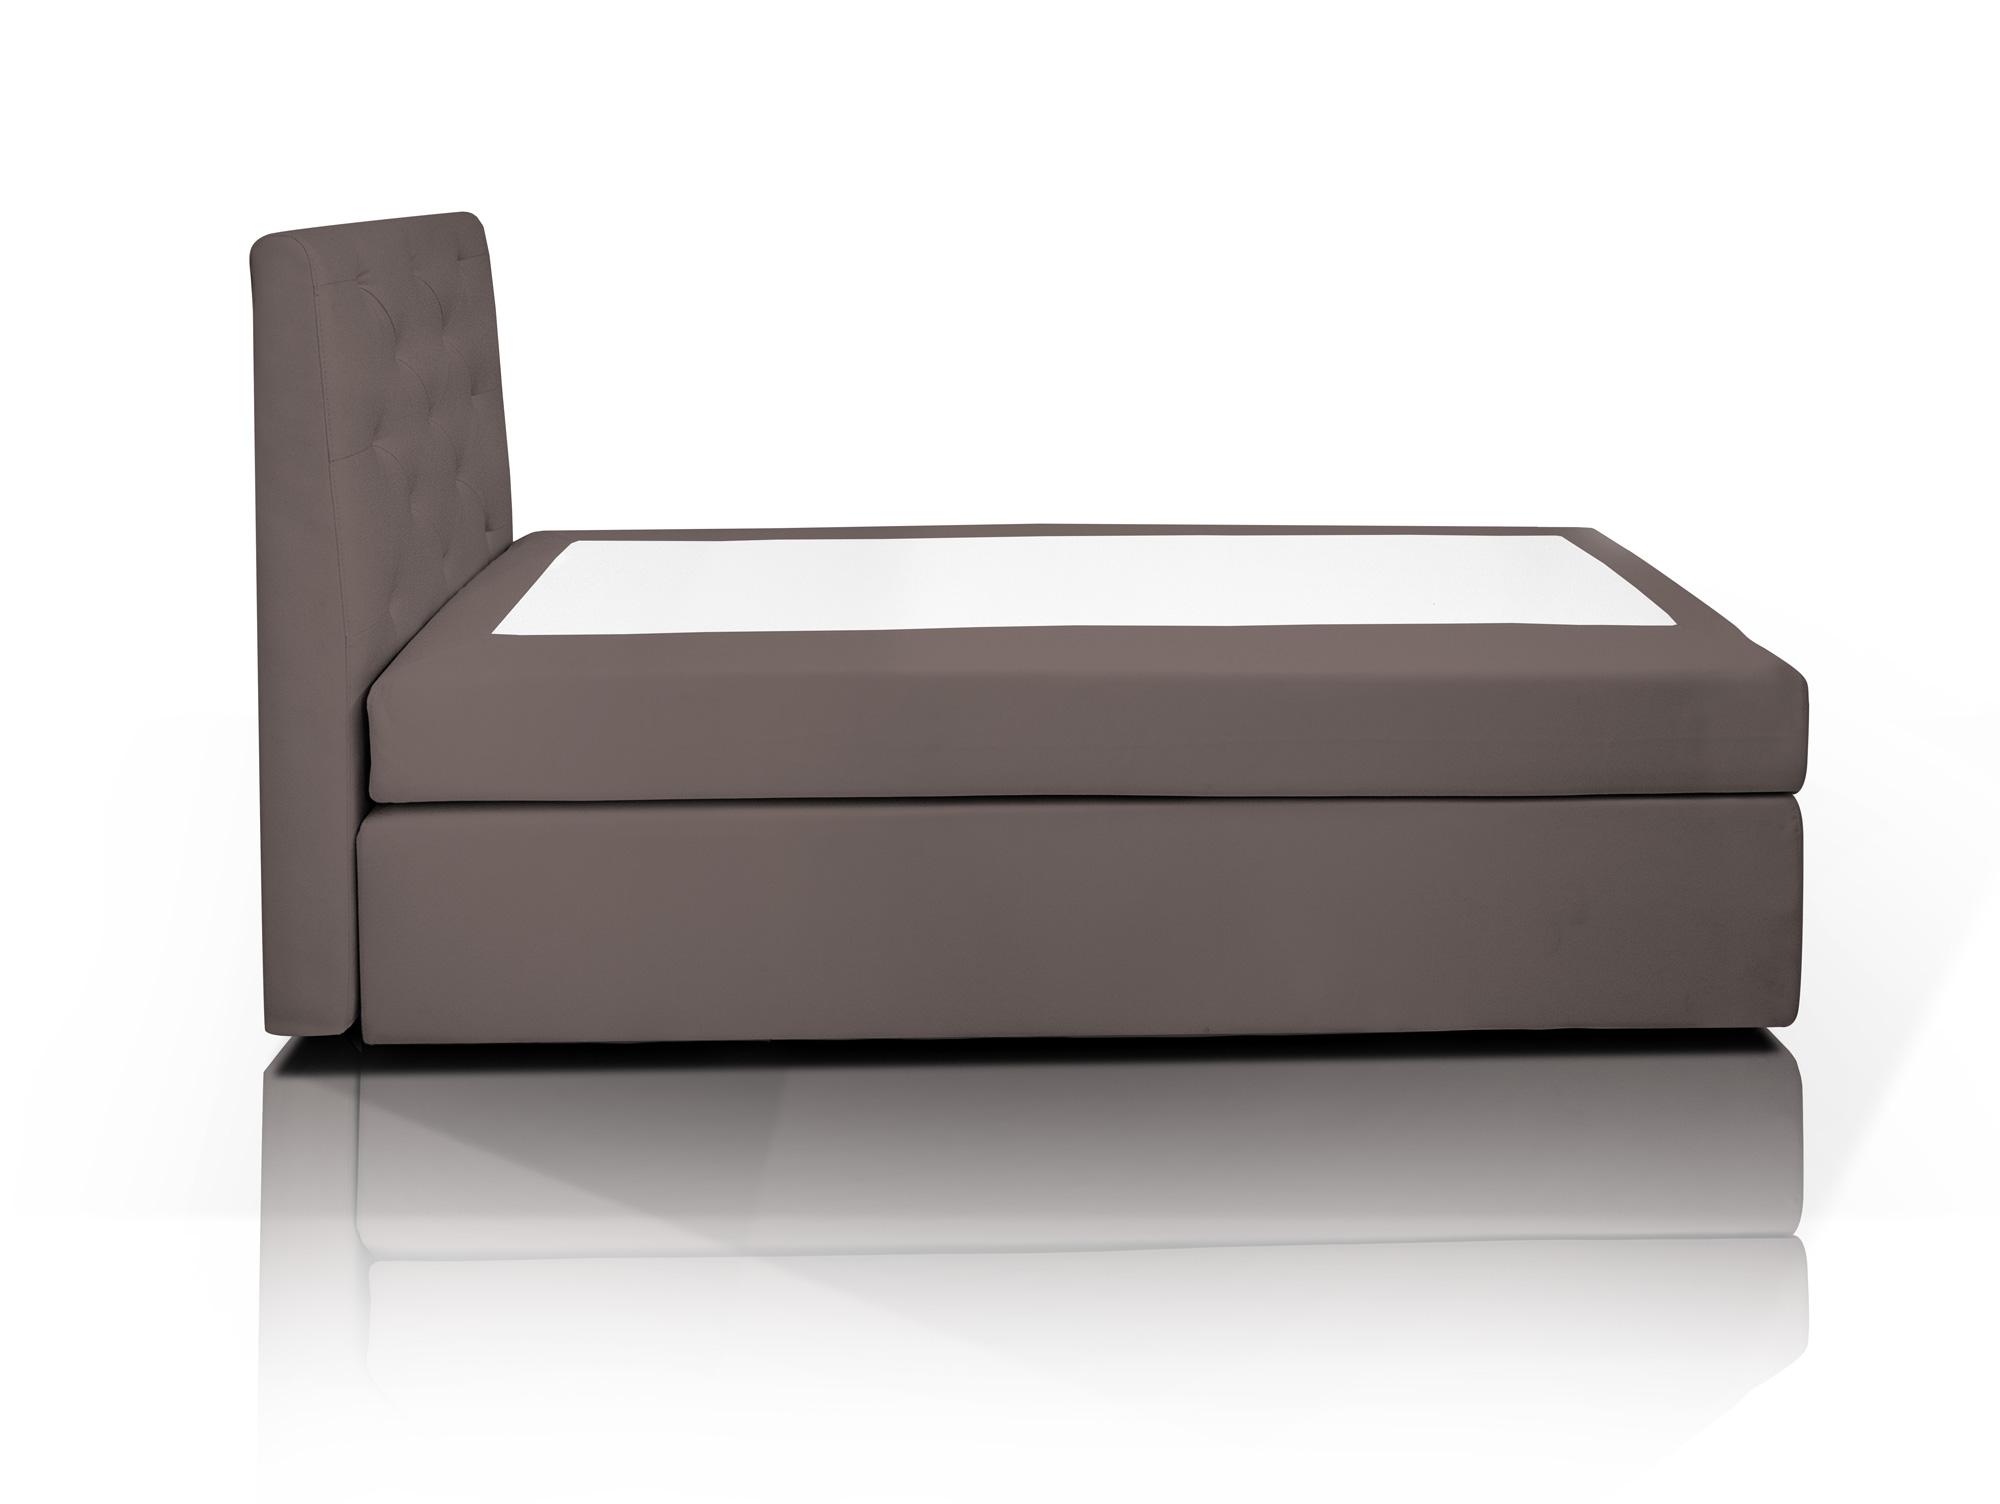 hotel boxspringbett webstoffbezug 80 x 200 cm braun h rtegrad 2. Black Bedroom Furniture Sets. Home Design Ideas